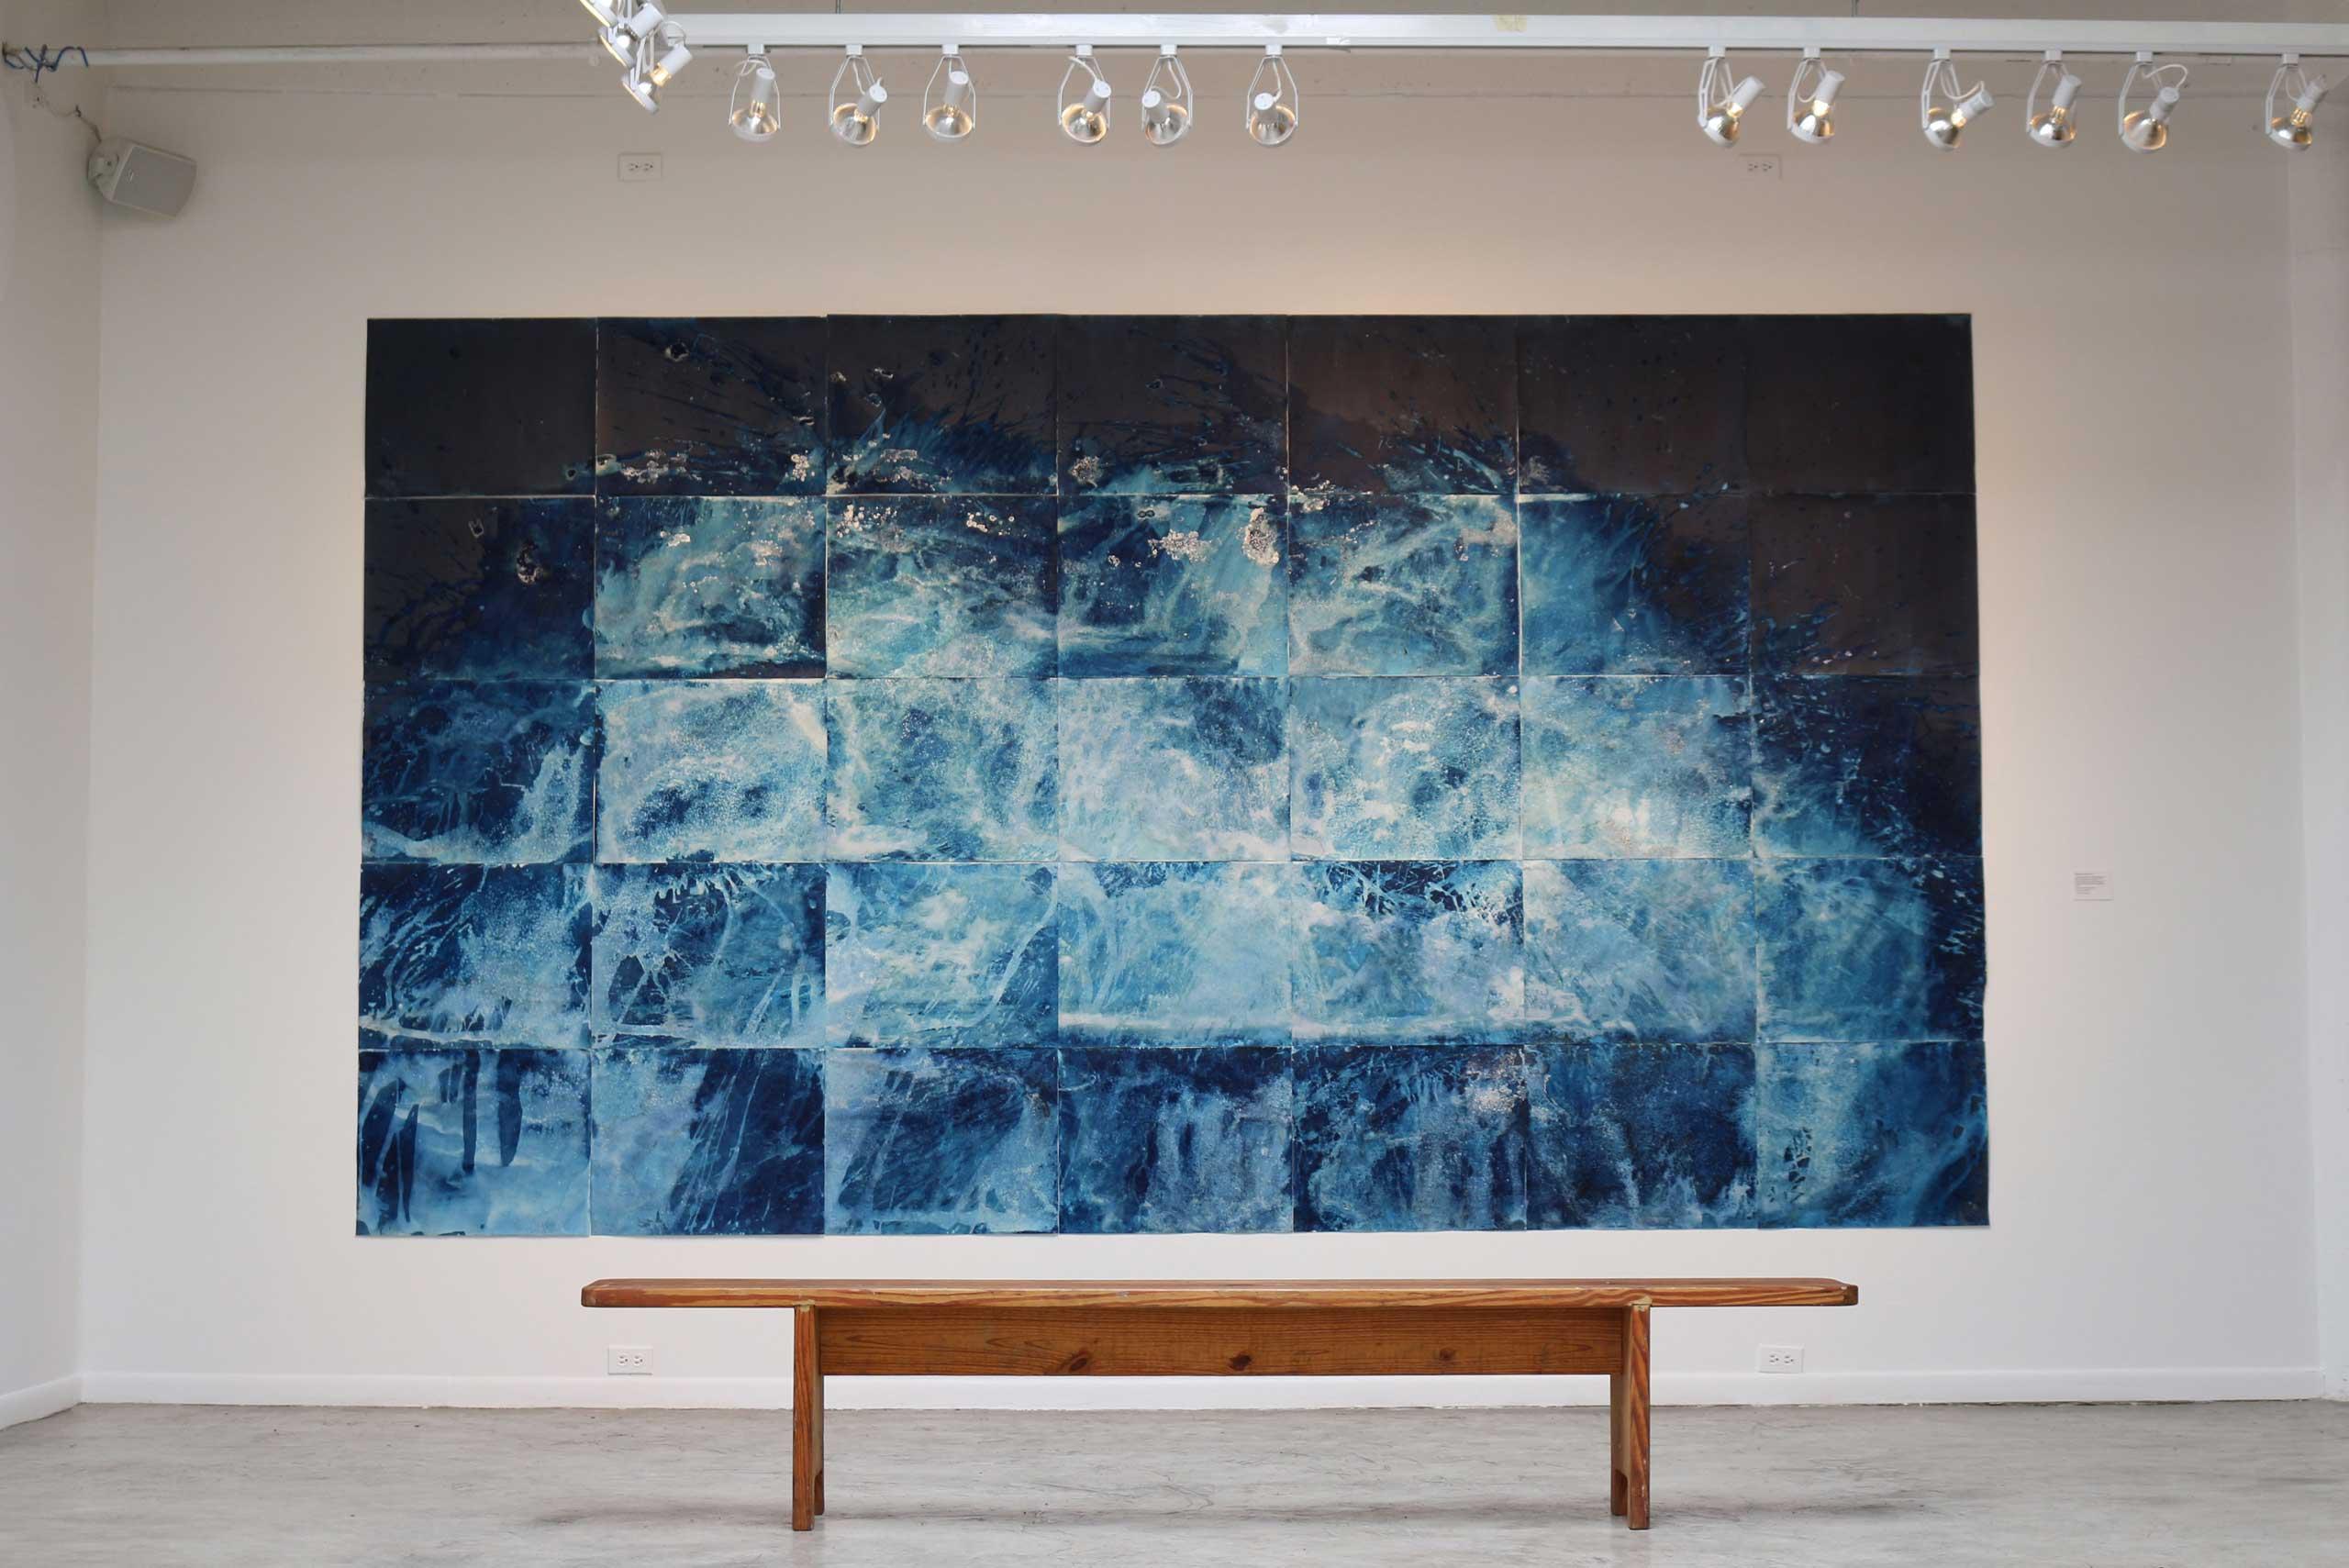 Meghann Riepenhoff's Littorial Drift exhibit at FotoFest's Discoveries of the Meeting Place exhibit.